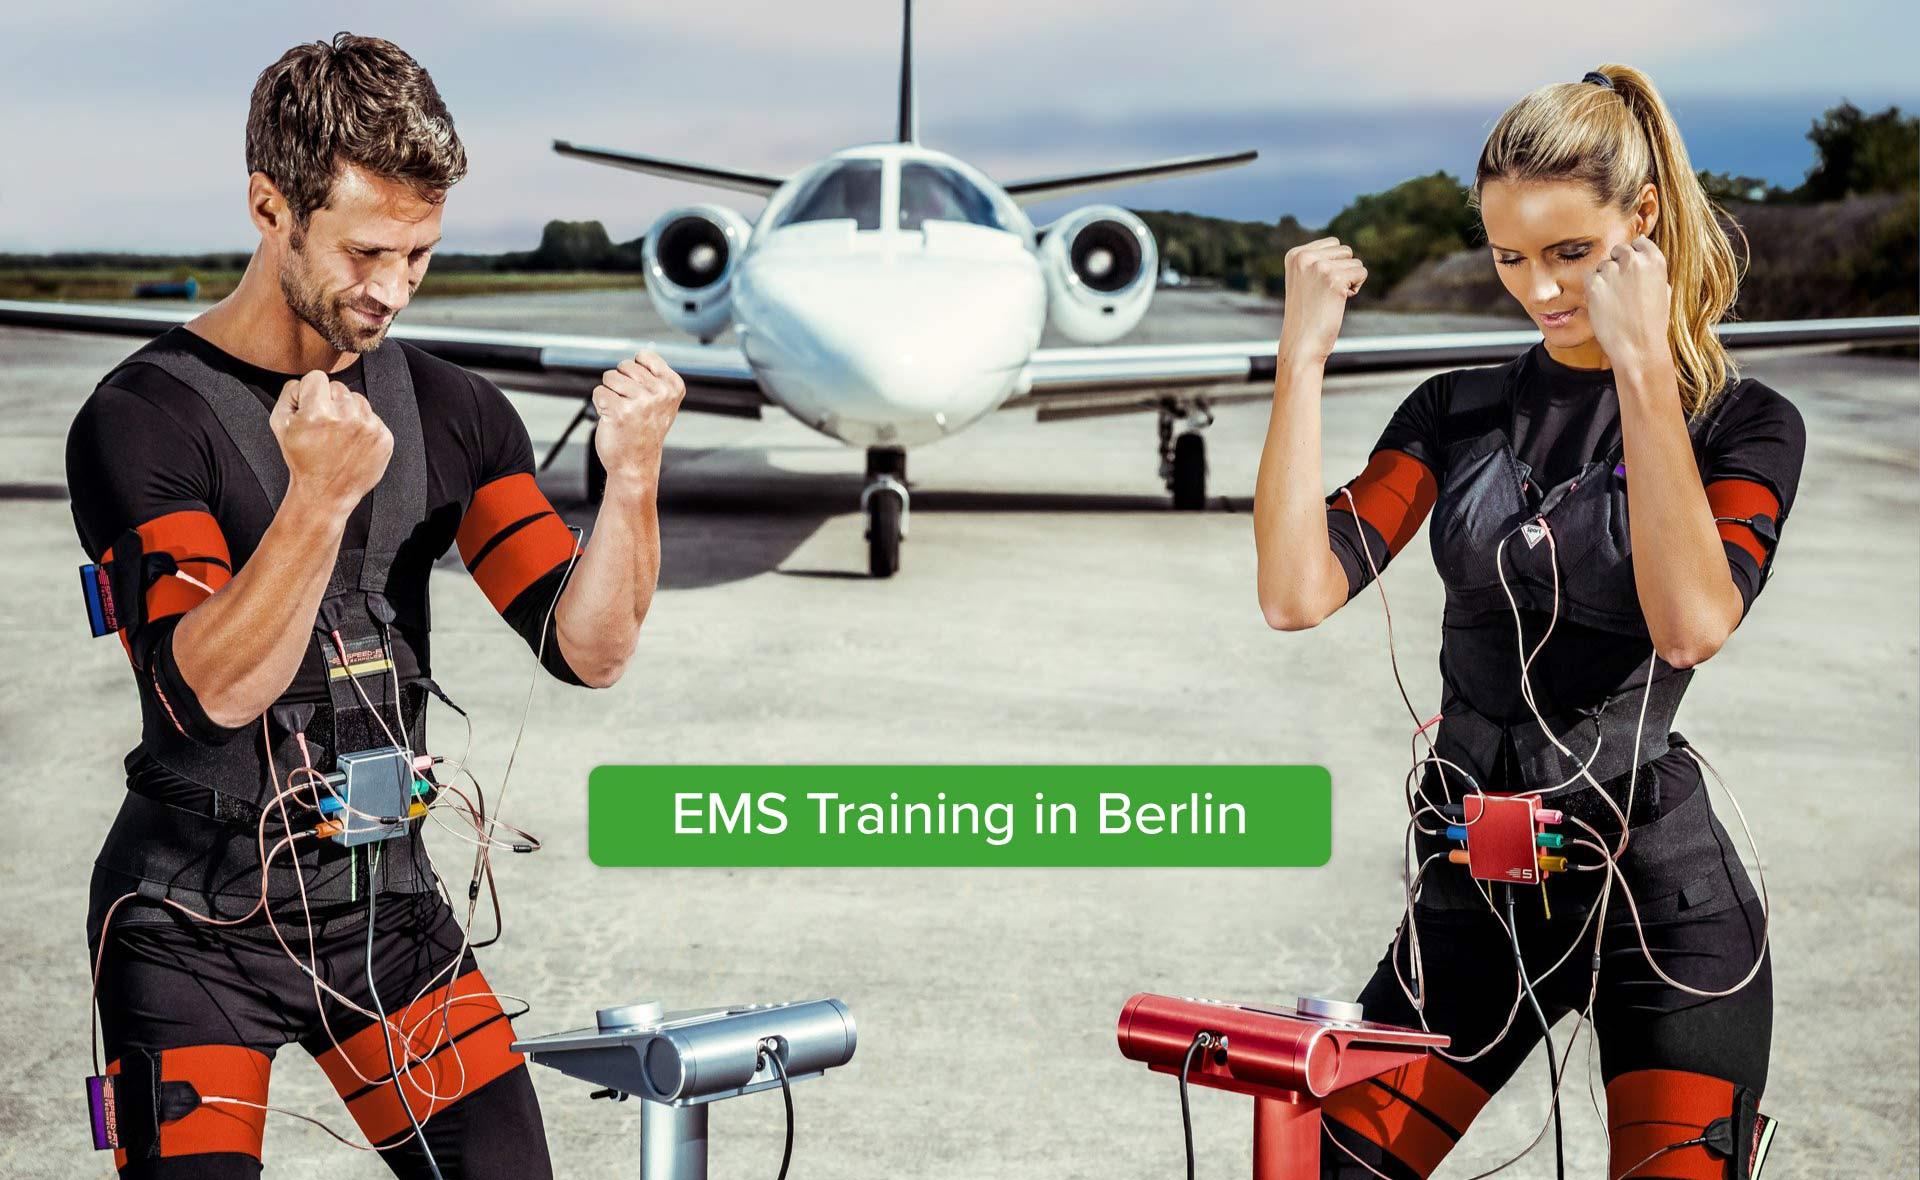 EMS Training in Berlin